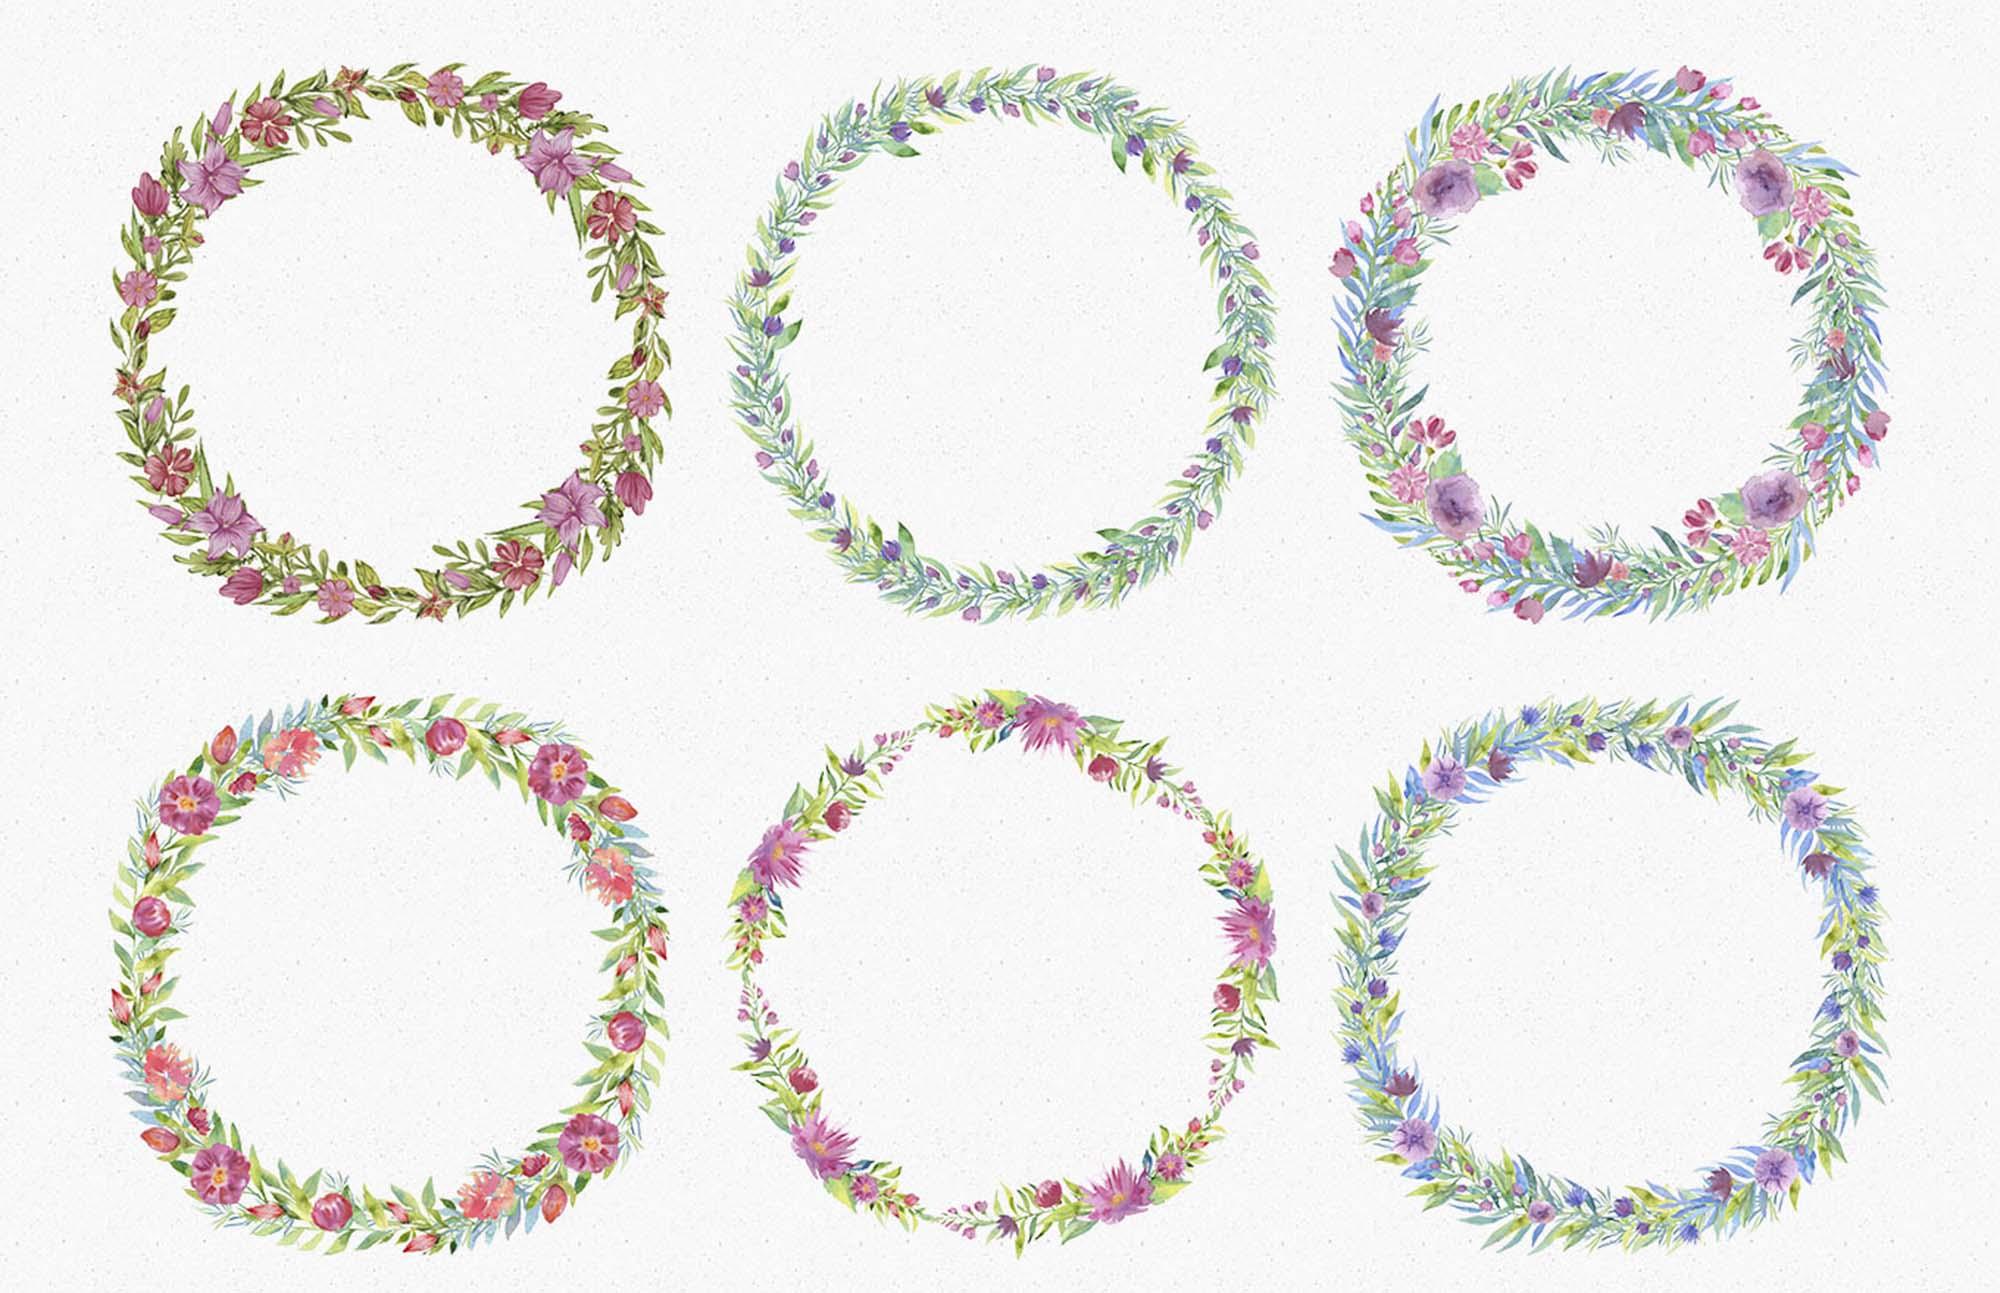 Spring Garden Watercolors Wreaths